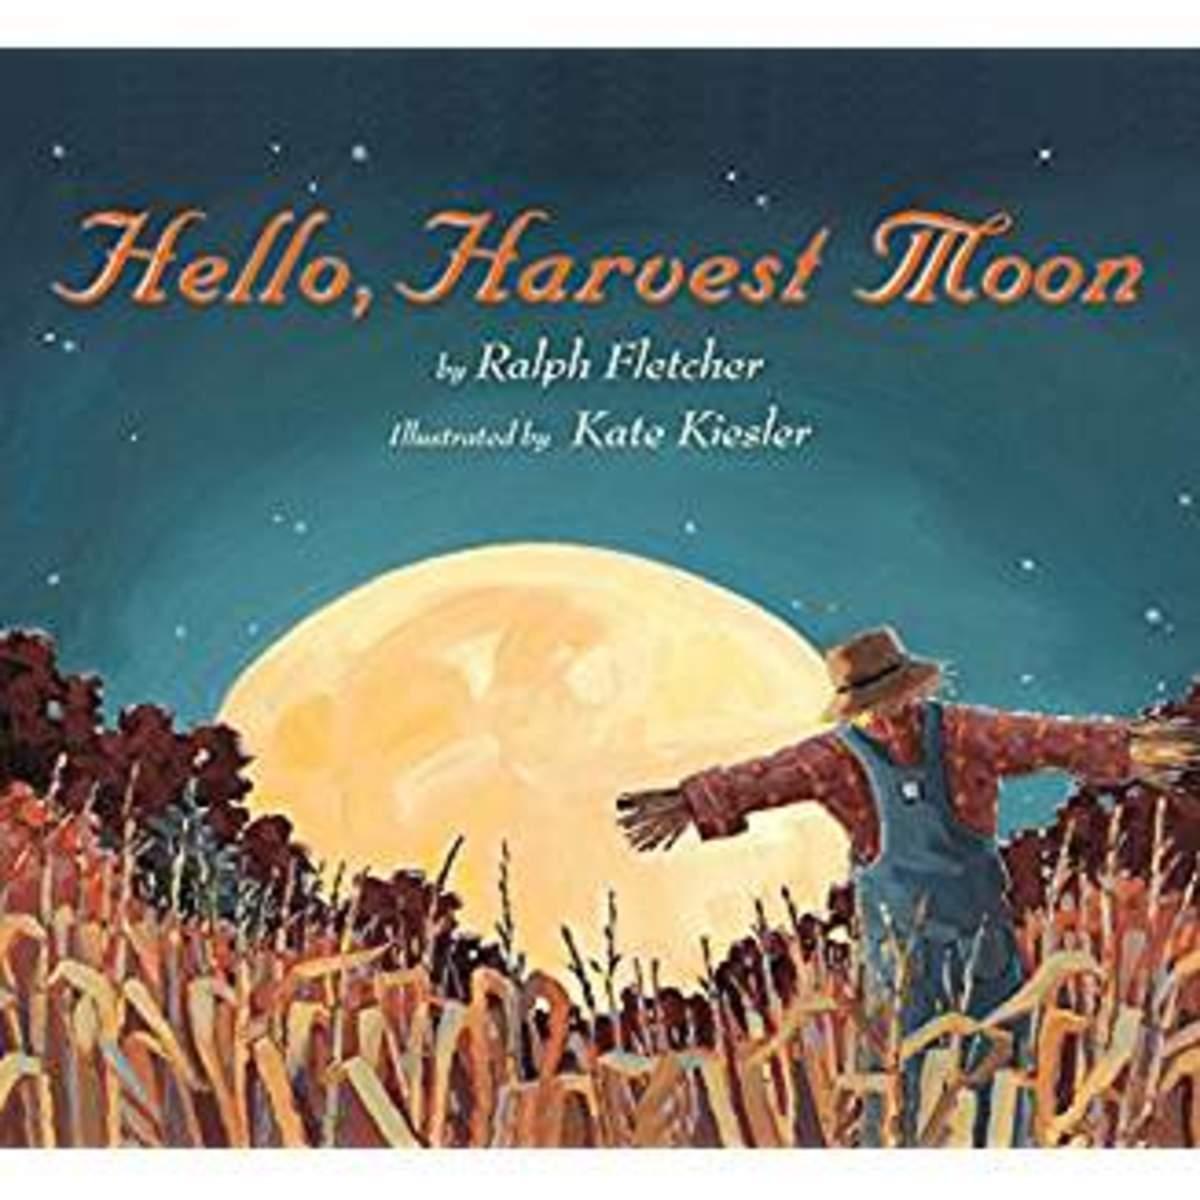 Hello, Harvest Moon by Ralph Fletcher